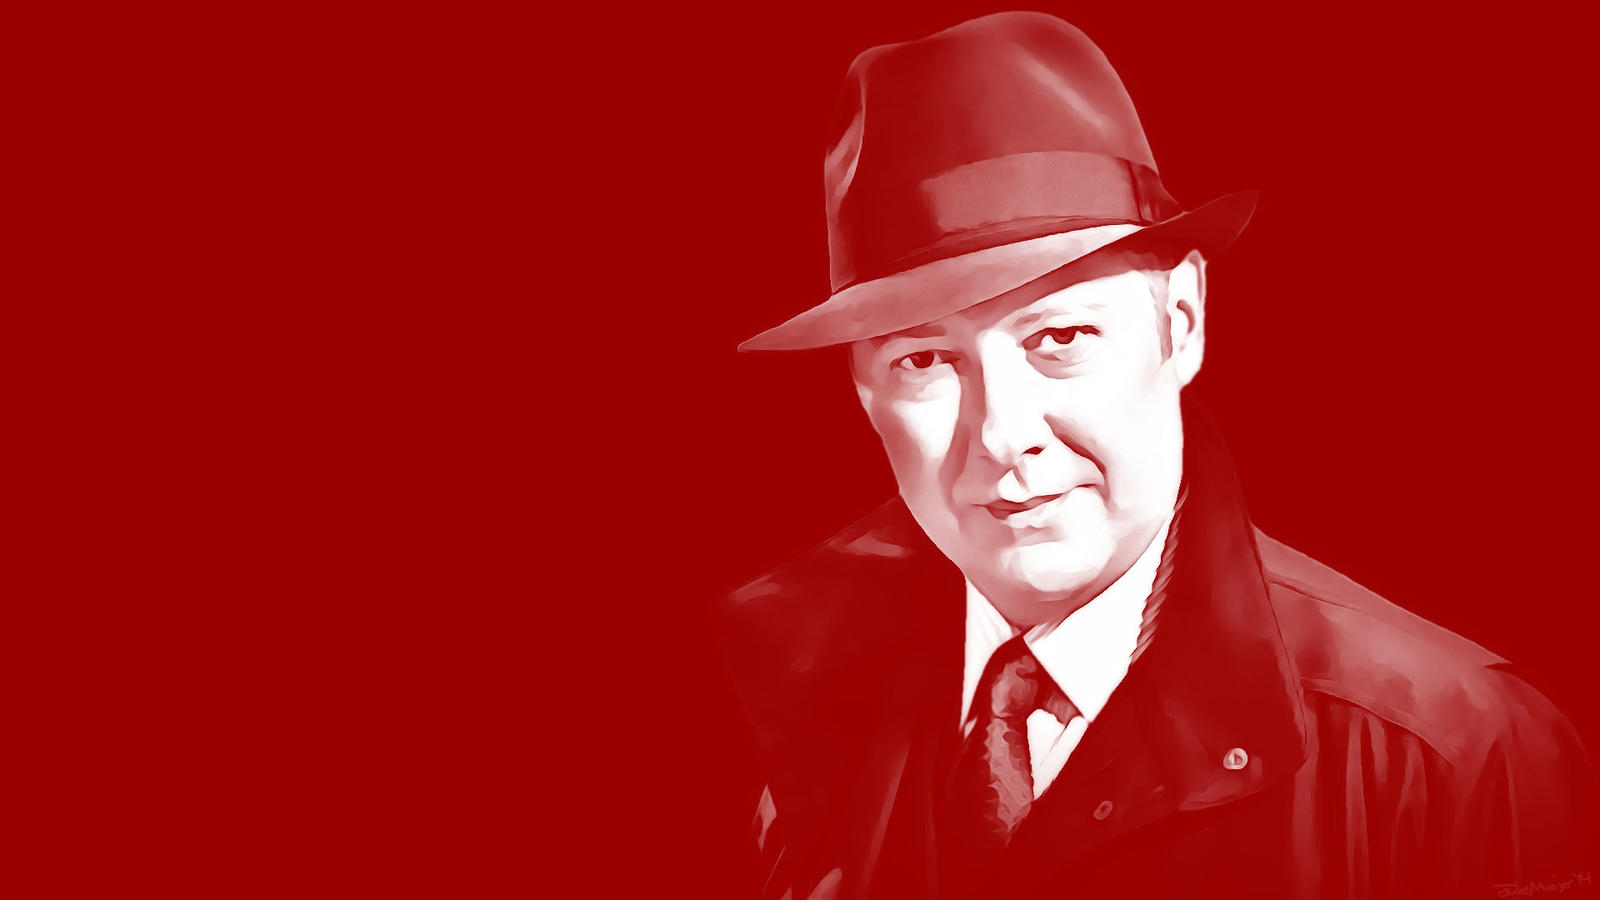 Red Red Reddington By Julesmeijer On DeviantArt